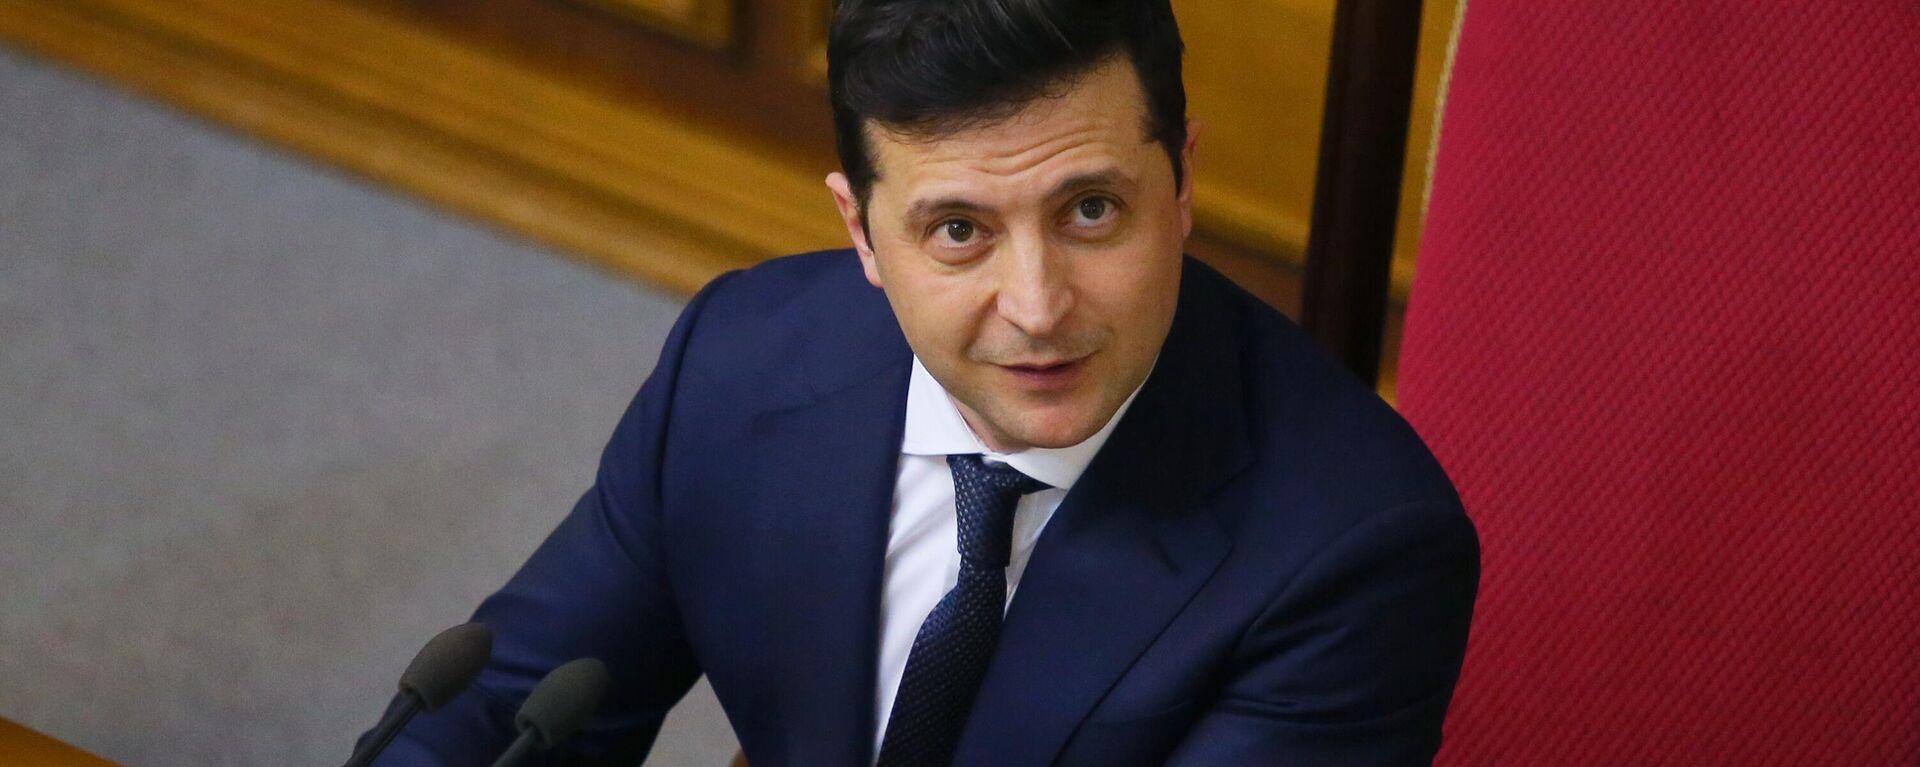 Der ukrainische Präsident Wladimir Selenski (Archivbild) - SNA, 1920, 03.02.2021